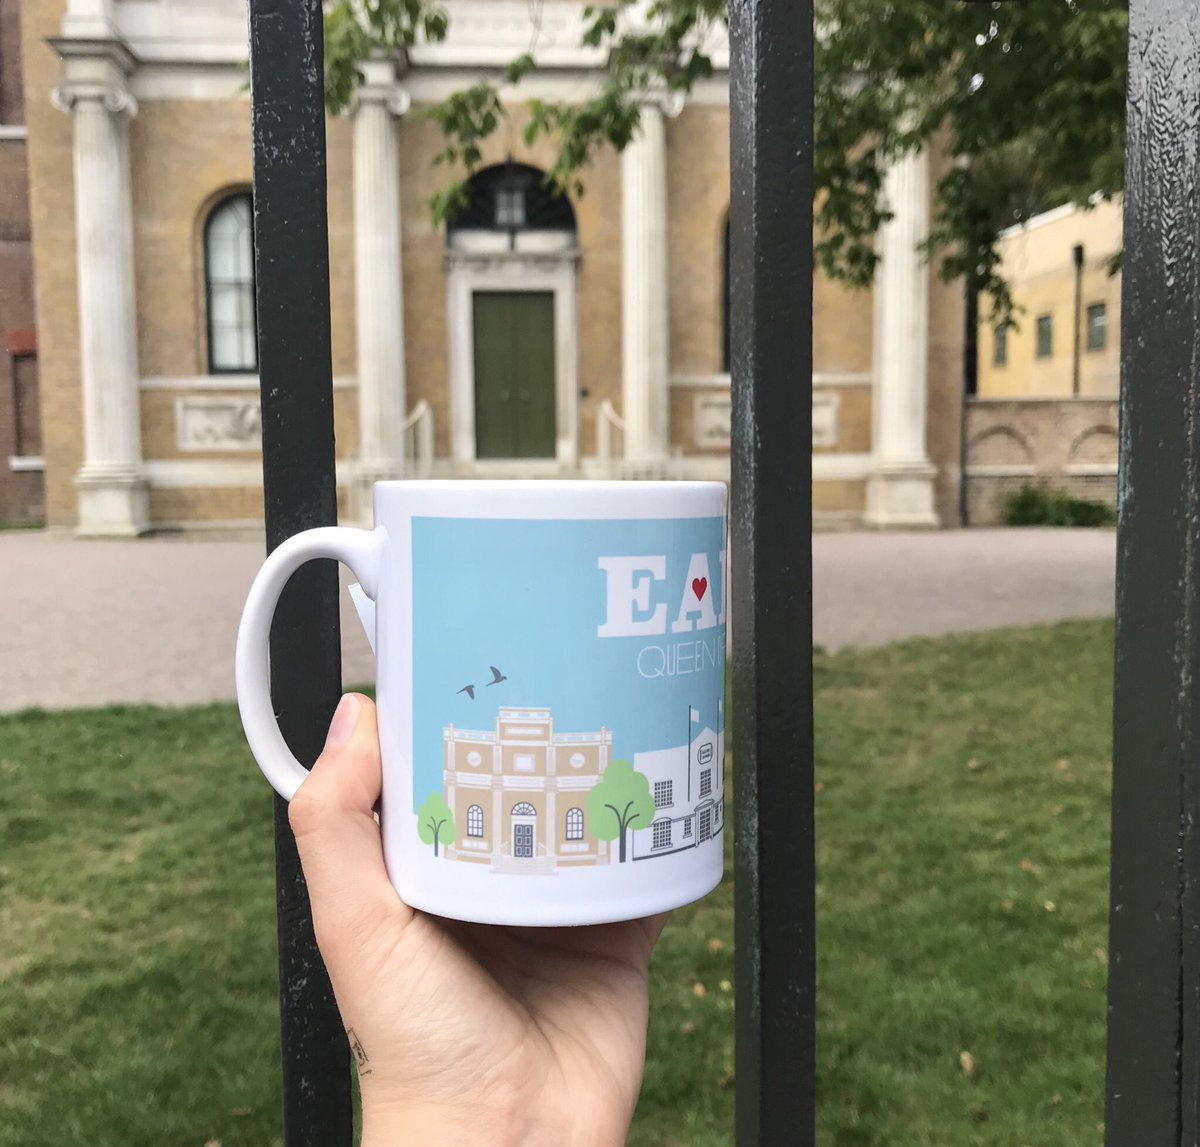 New Ealing mugs from the brilliant @CBerridgeStudio ☕️  . #mug #ealing #ealingmug #ealingstudios #pitzhangermanor #ealingtownhall #smallbusiness #localshop #lovelocal #supportlocal #localbusiness #ealing #ealinggreen #ealingfeeling #ealingbroadway #westlondon #alloriginal https://t.co/7Zdt0JcJn5